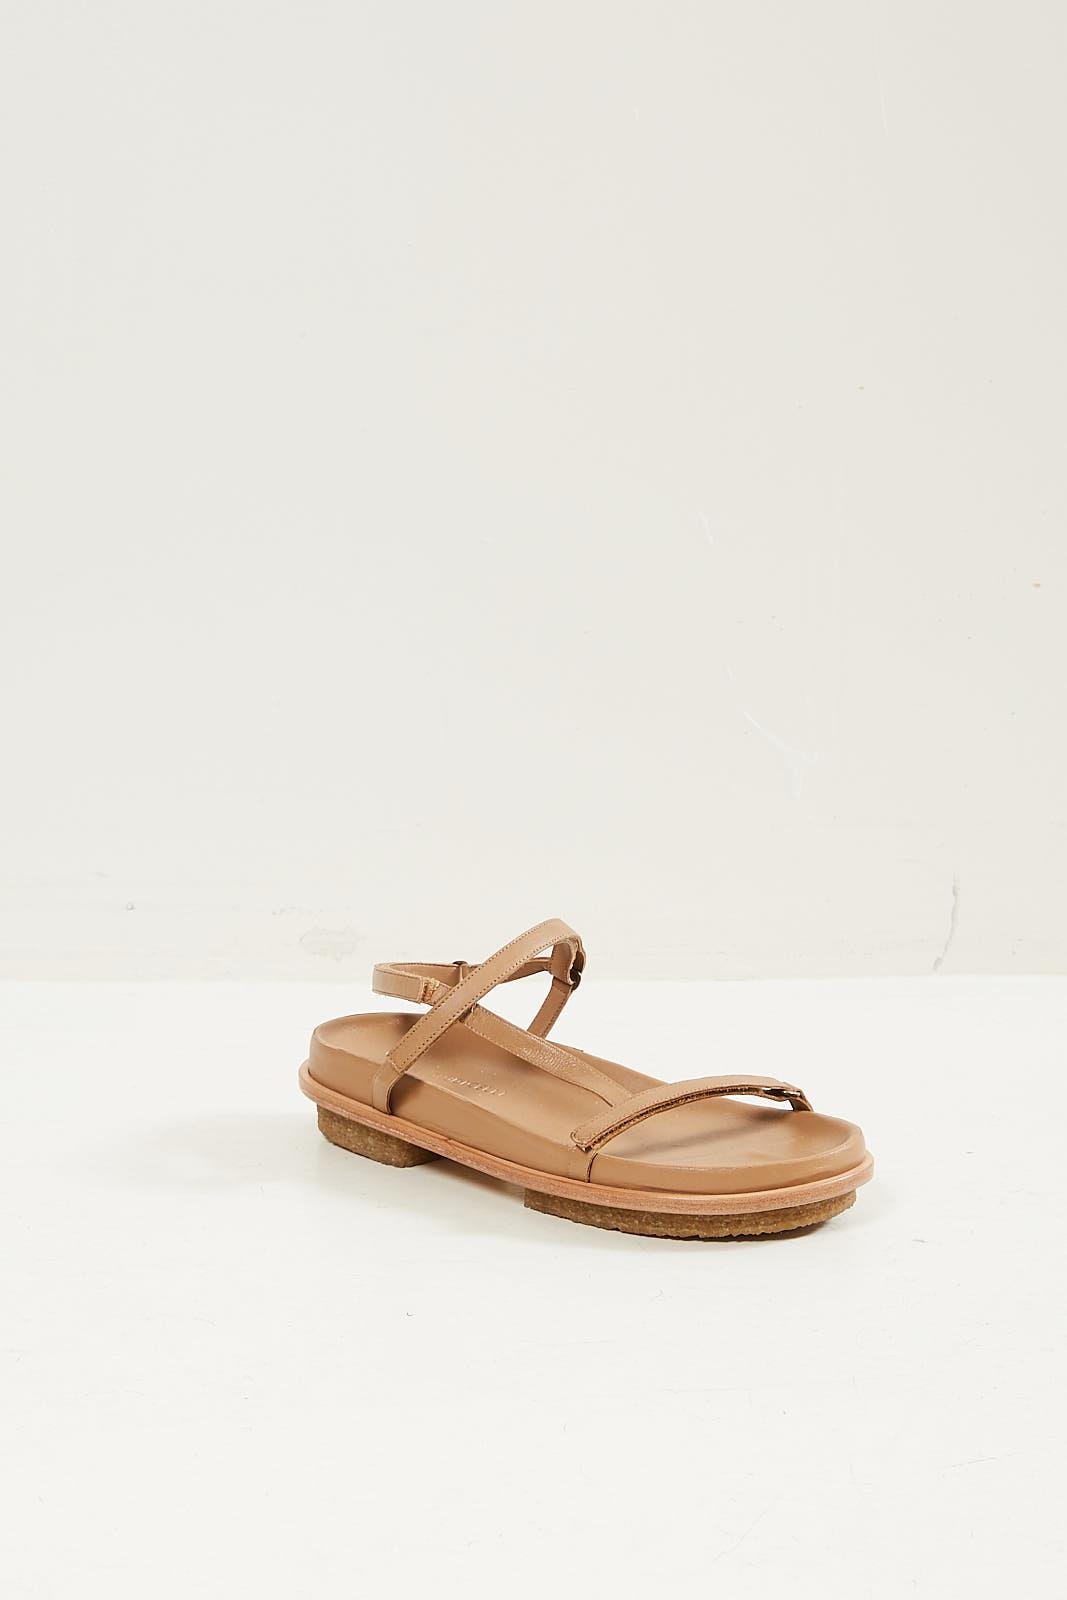 Mari Giudicelli Isabel sandal camel